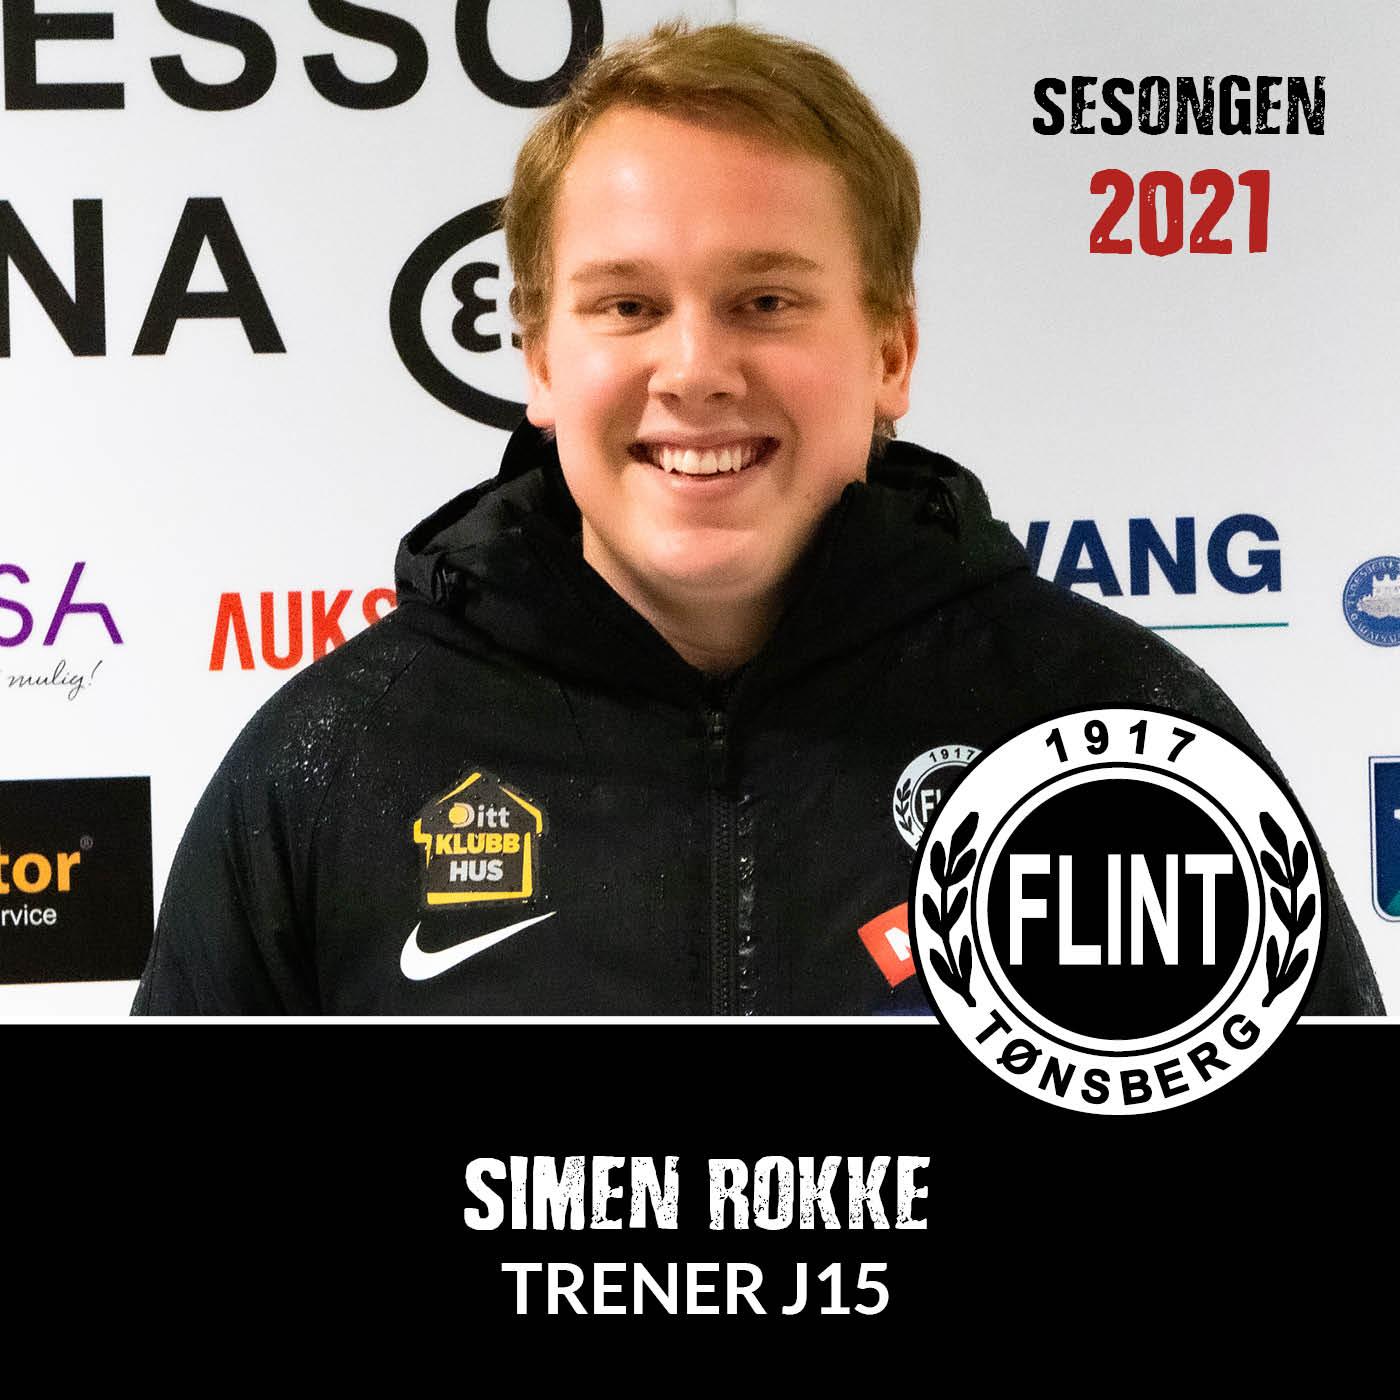 https://www.flintfotball.no/wp-content/uploads/2021/02/Trener-Simen-Rokke.jpg